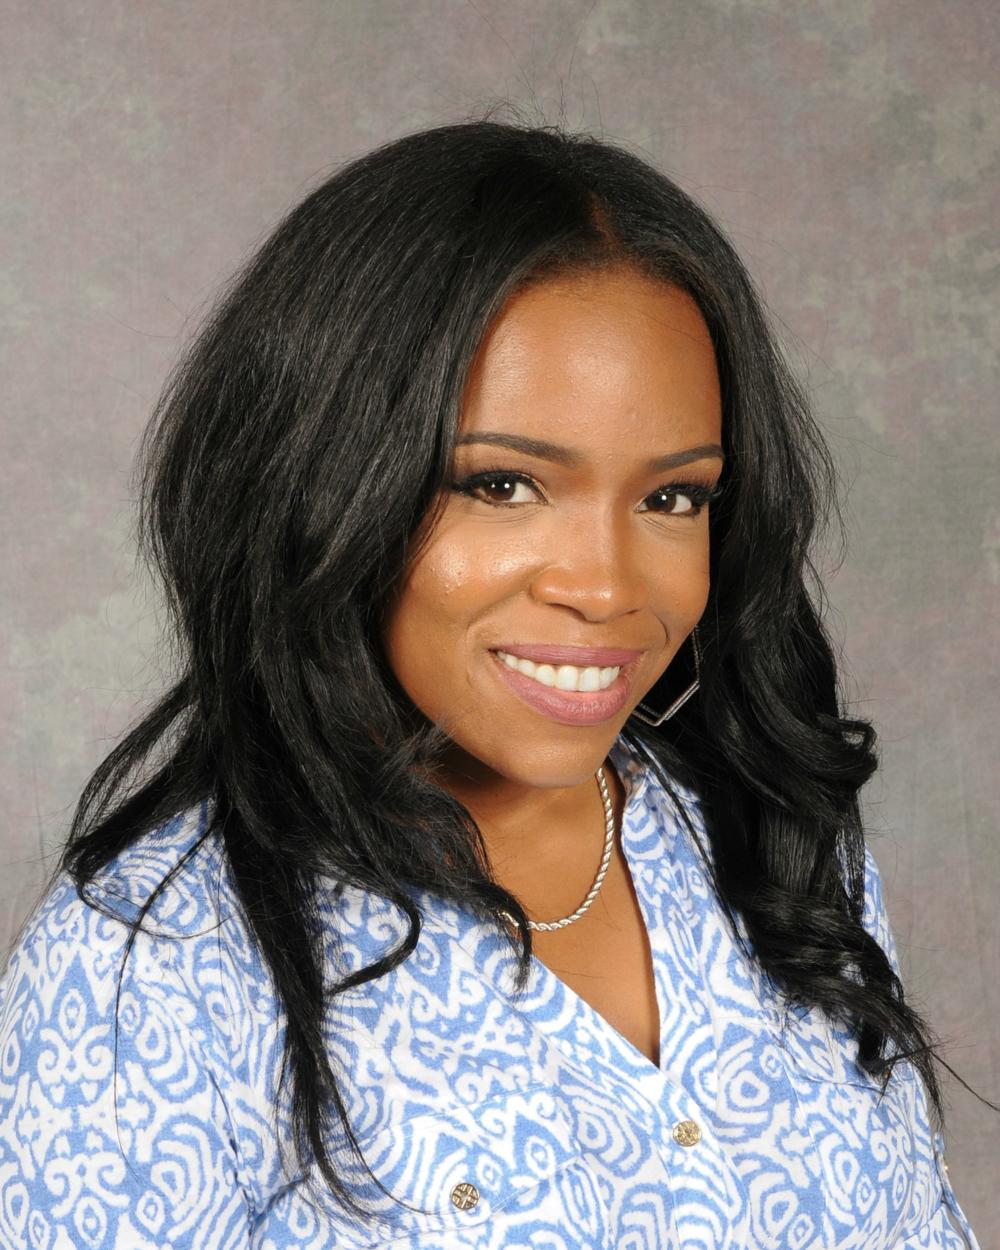 Shir-Rhea M. Watson-Moore, Board of Directors